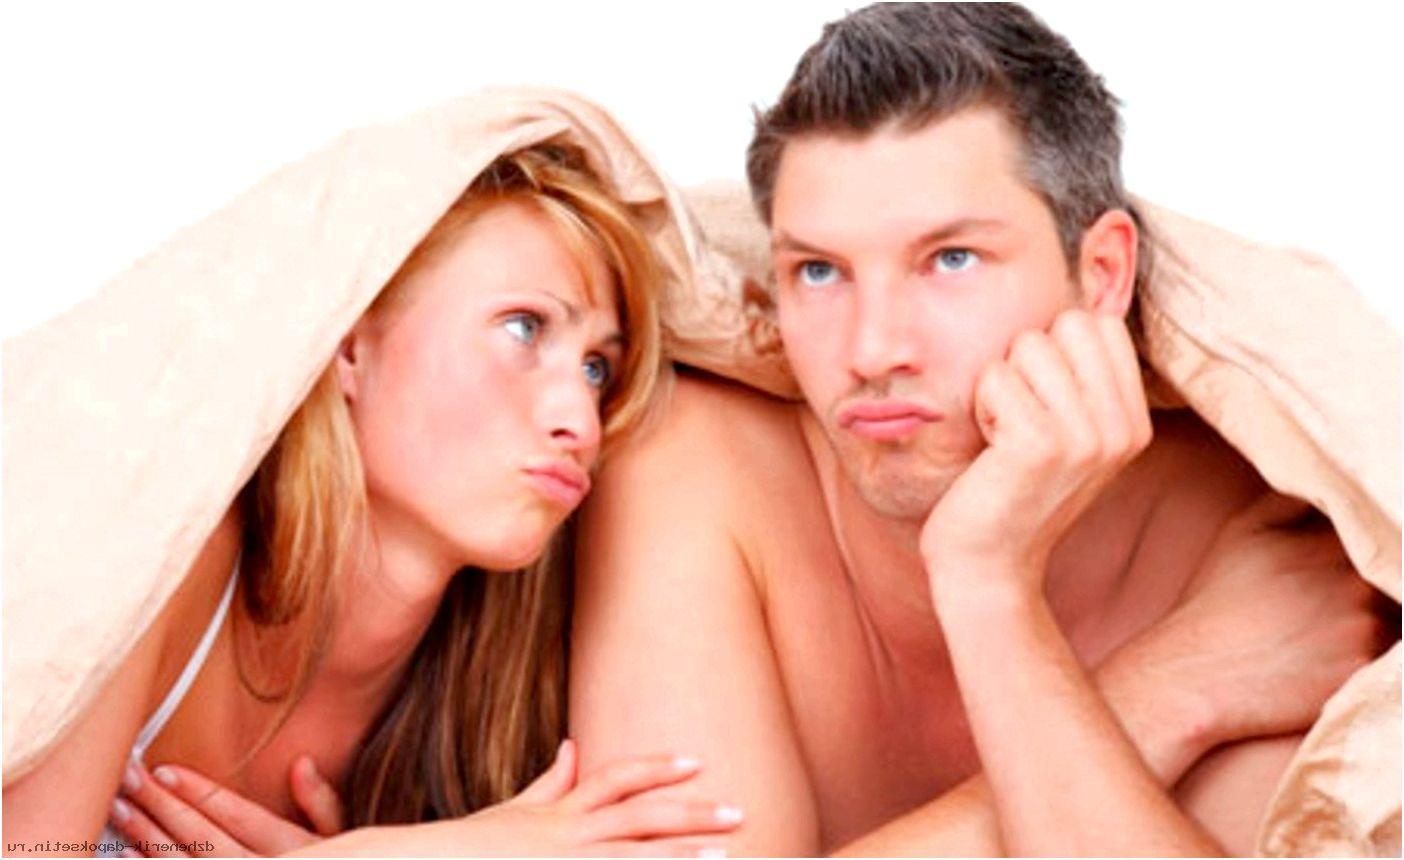 регулярный секс за и против